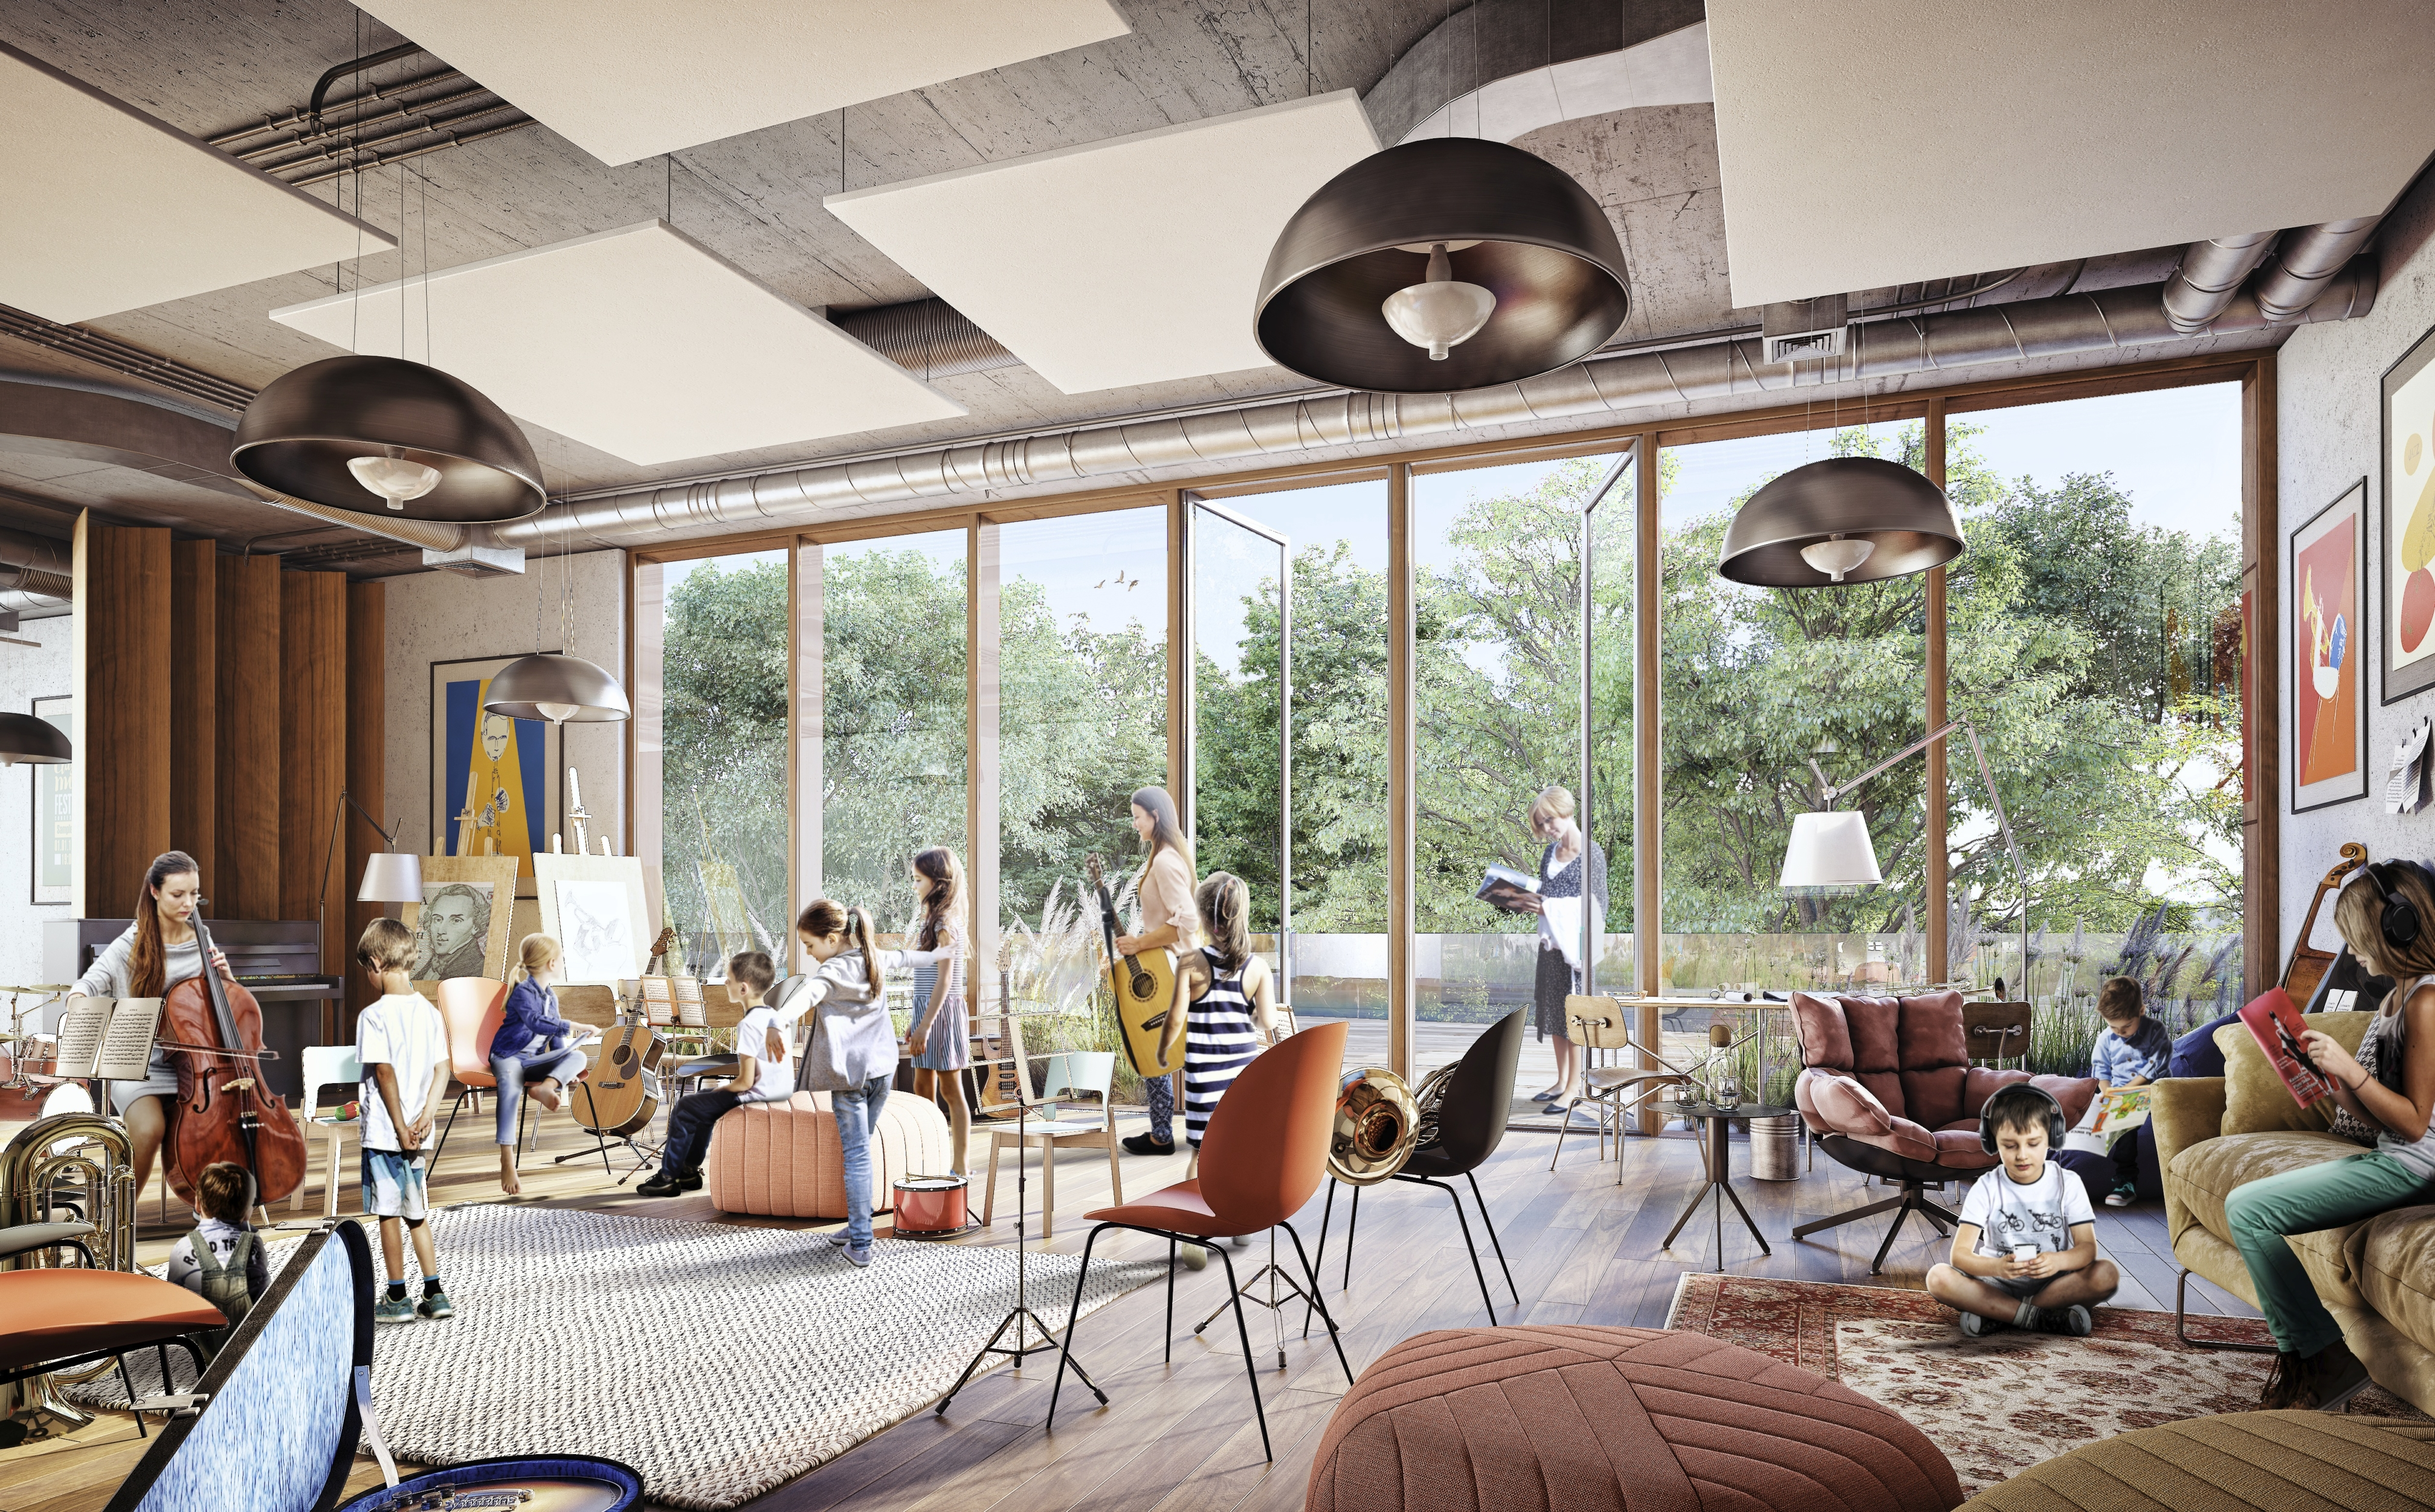 Chopin International Music Centre HRA Architekci 2018 rehersal and educational room